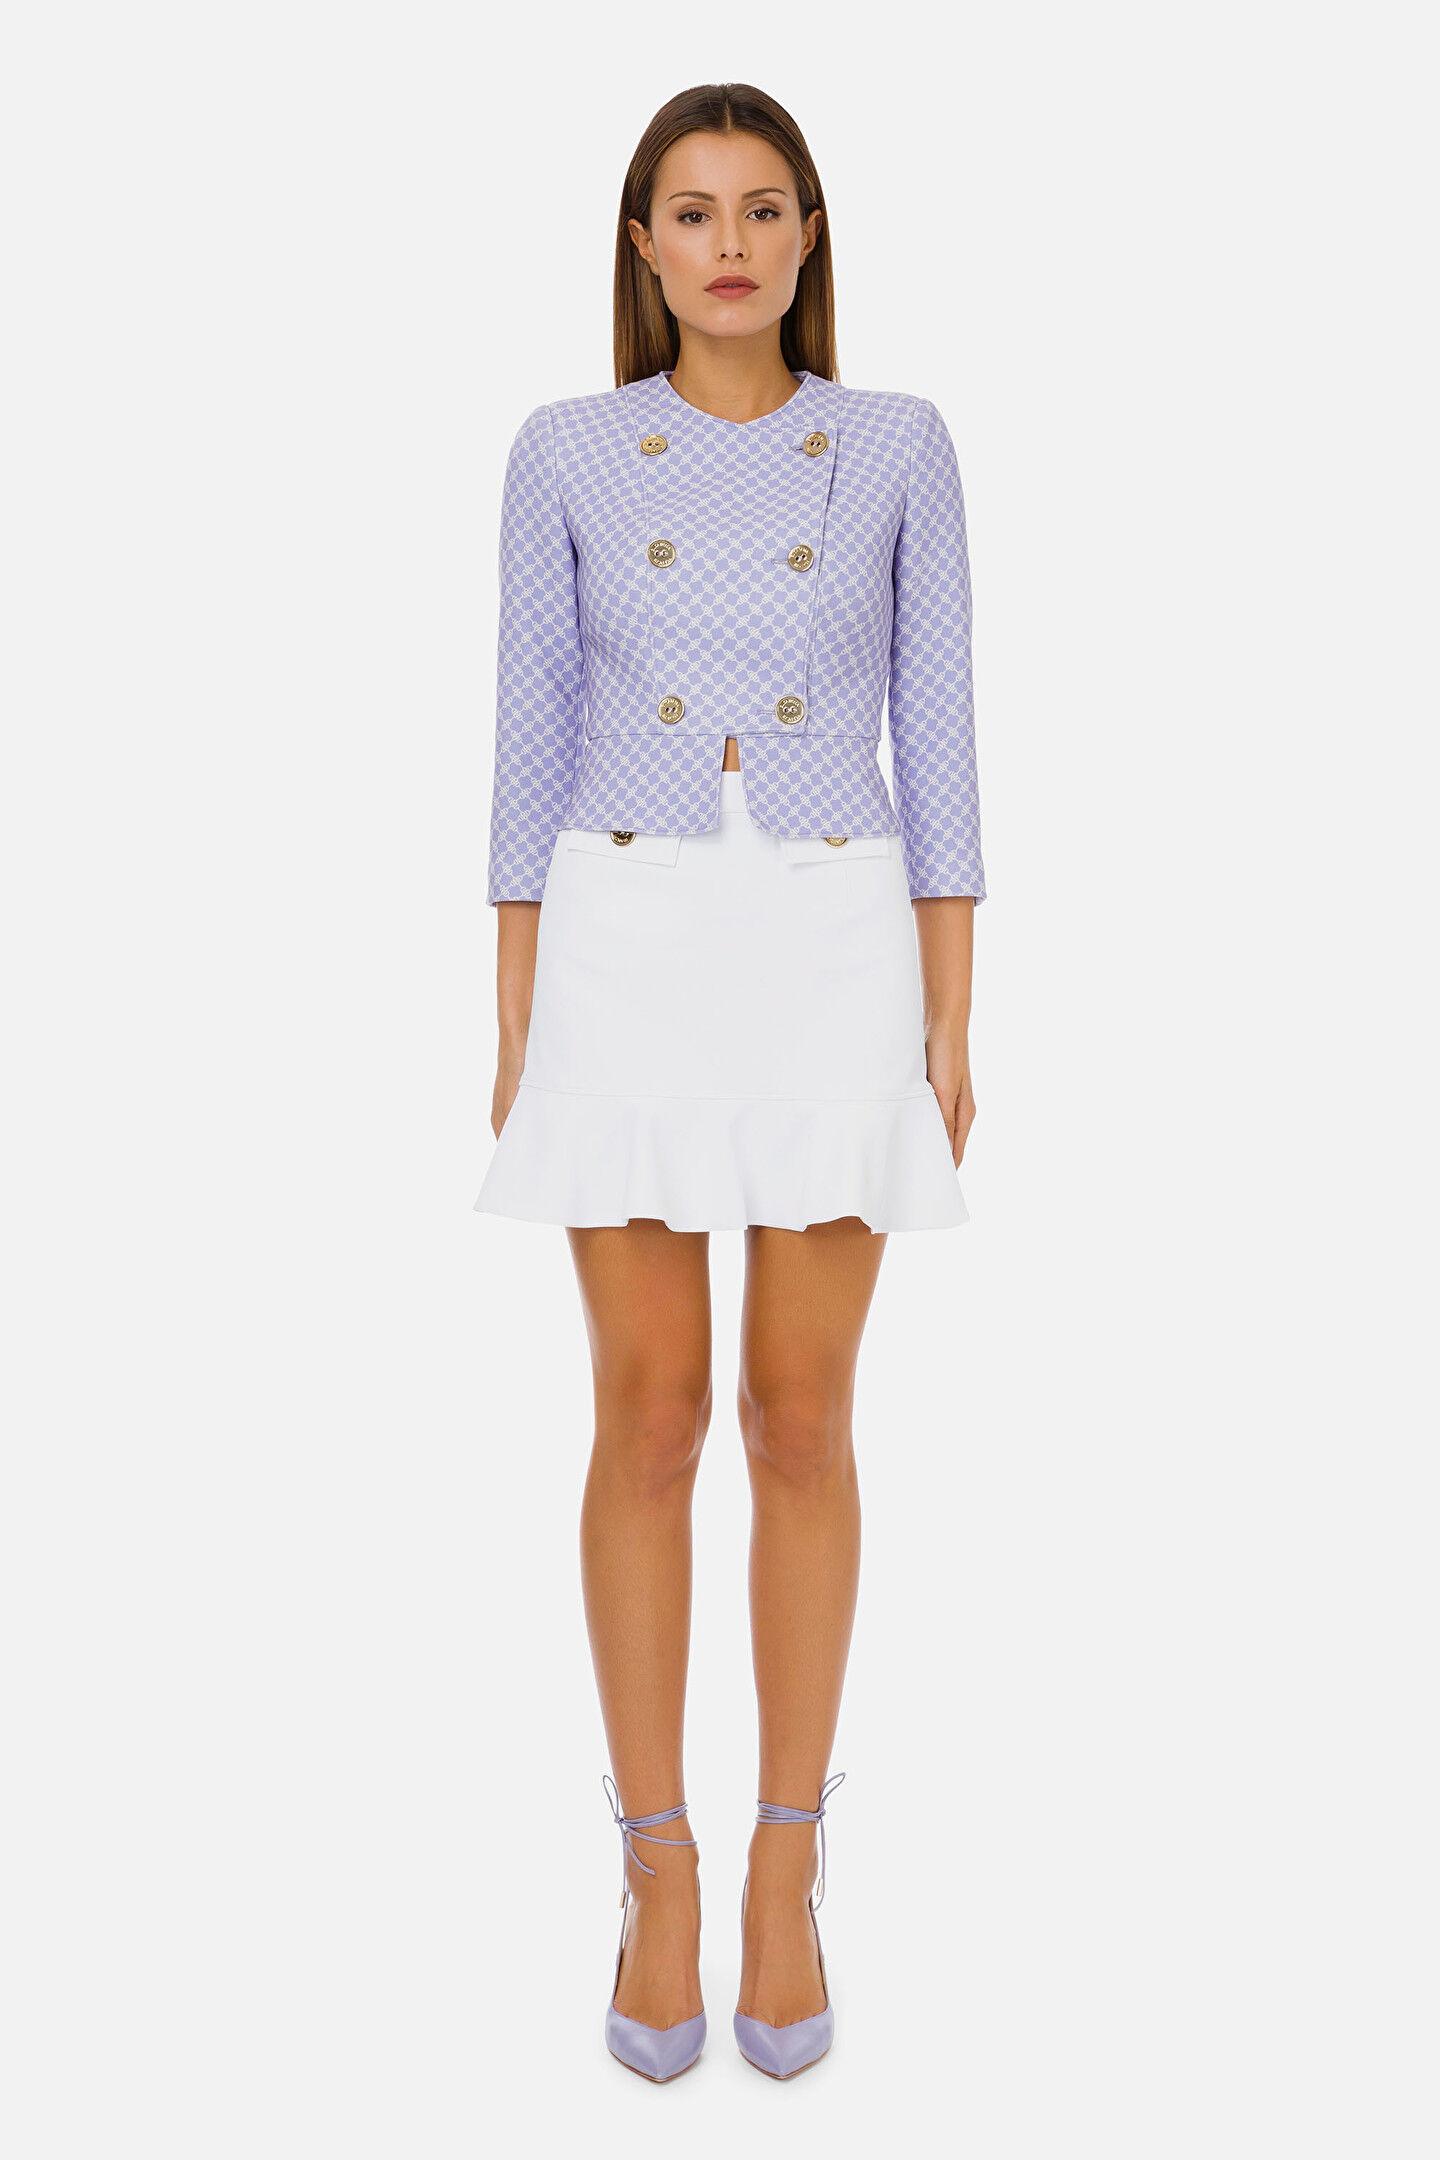 Double-Breasted Short Jacket Elisabetta Franchi - Elisabetta Franchi